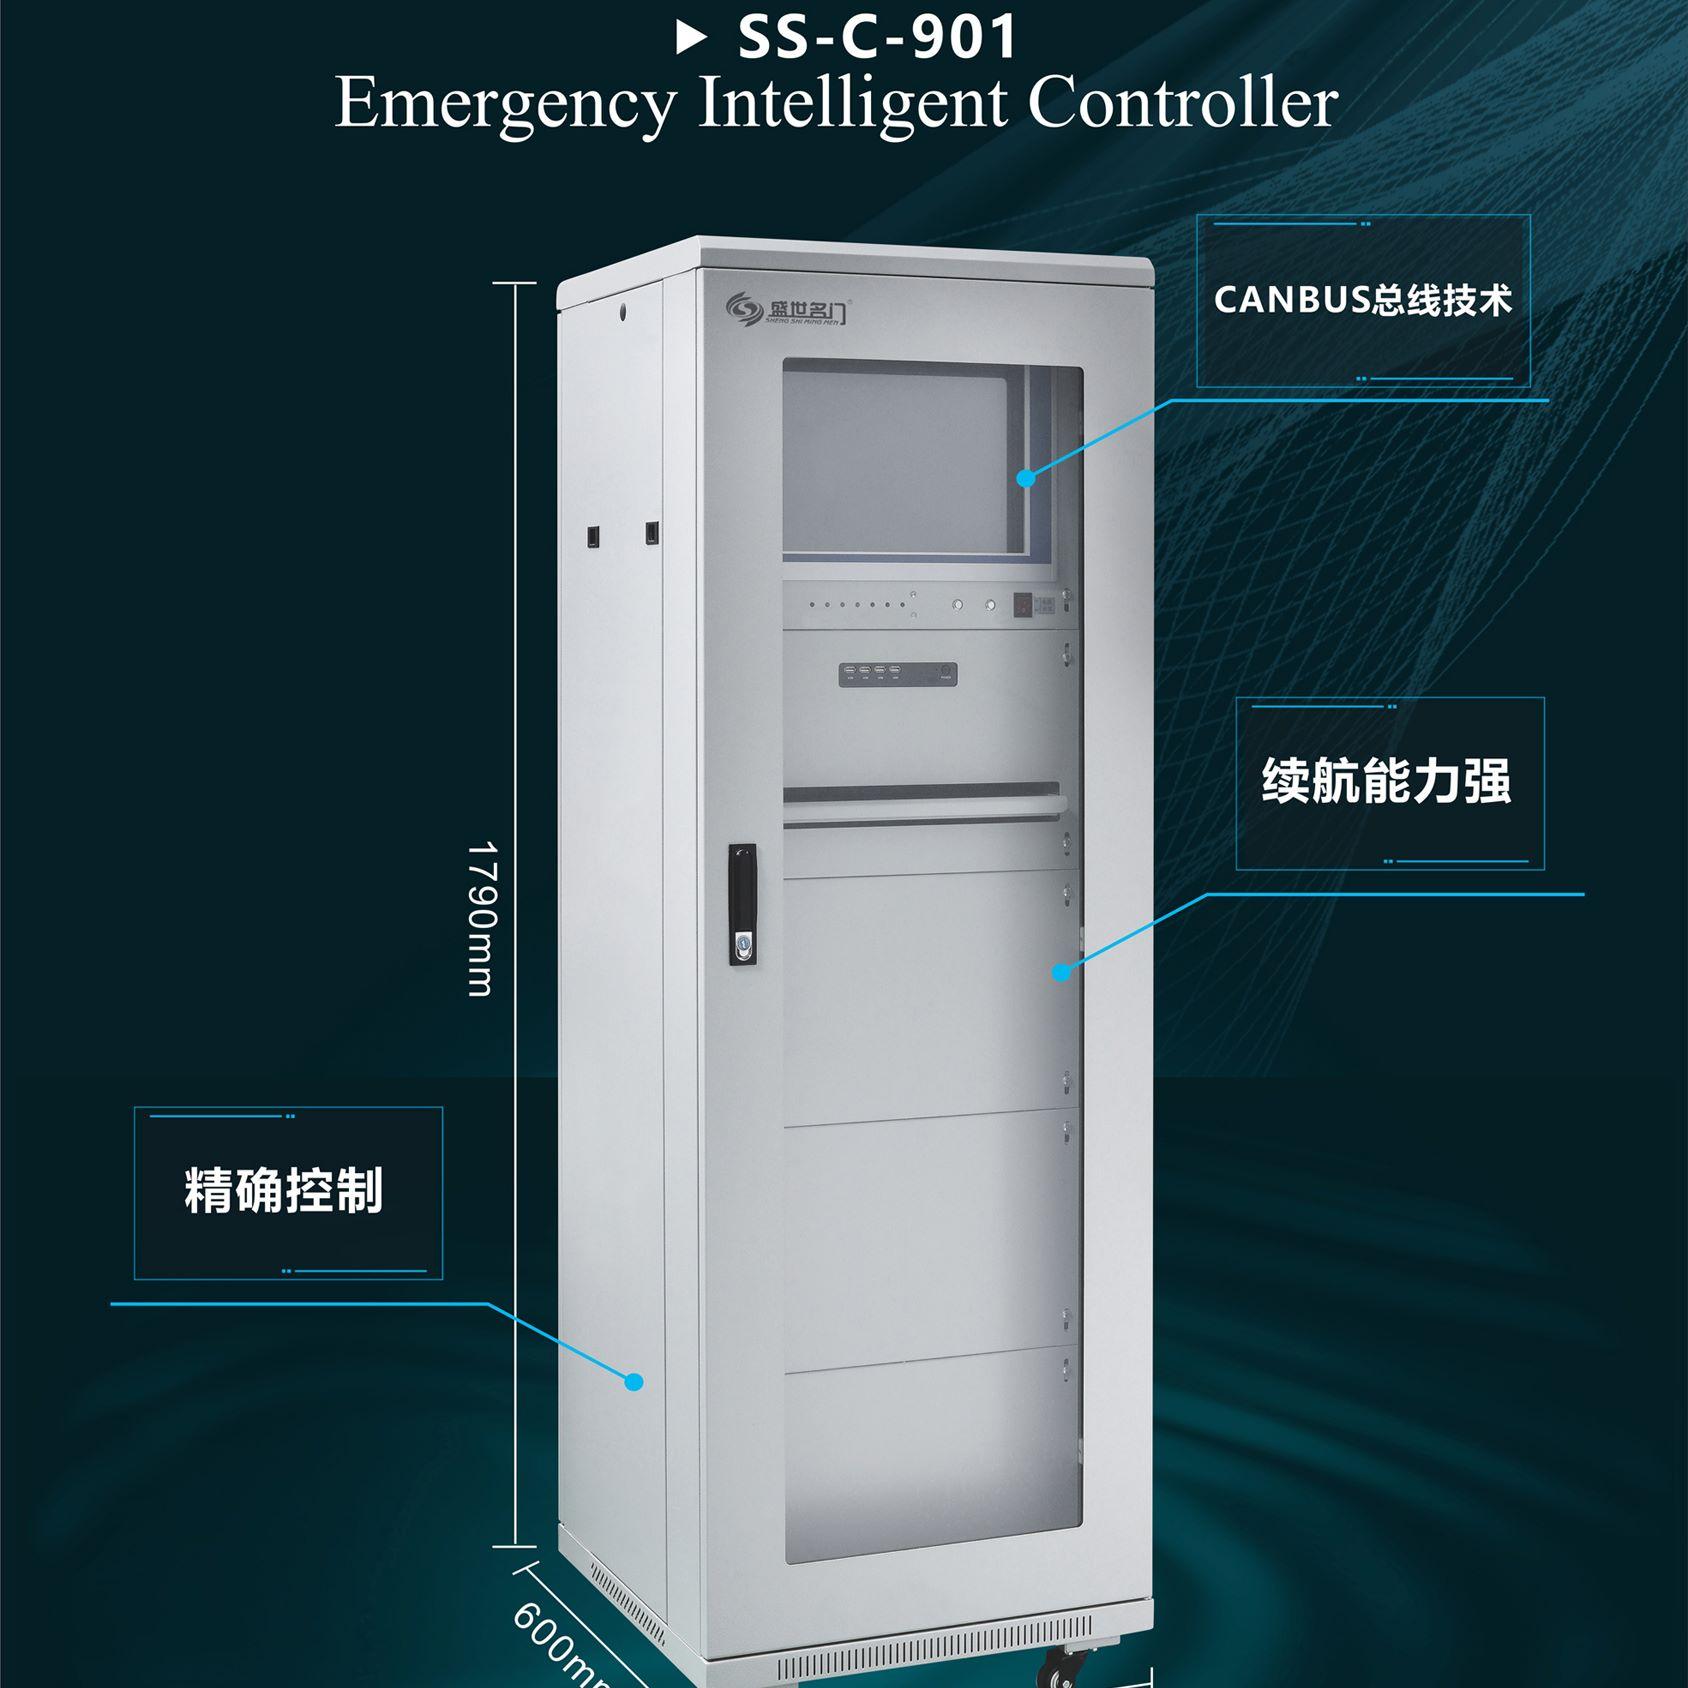 EPS消防应急照明疏散系统智能控制器SS-C-901